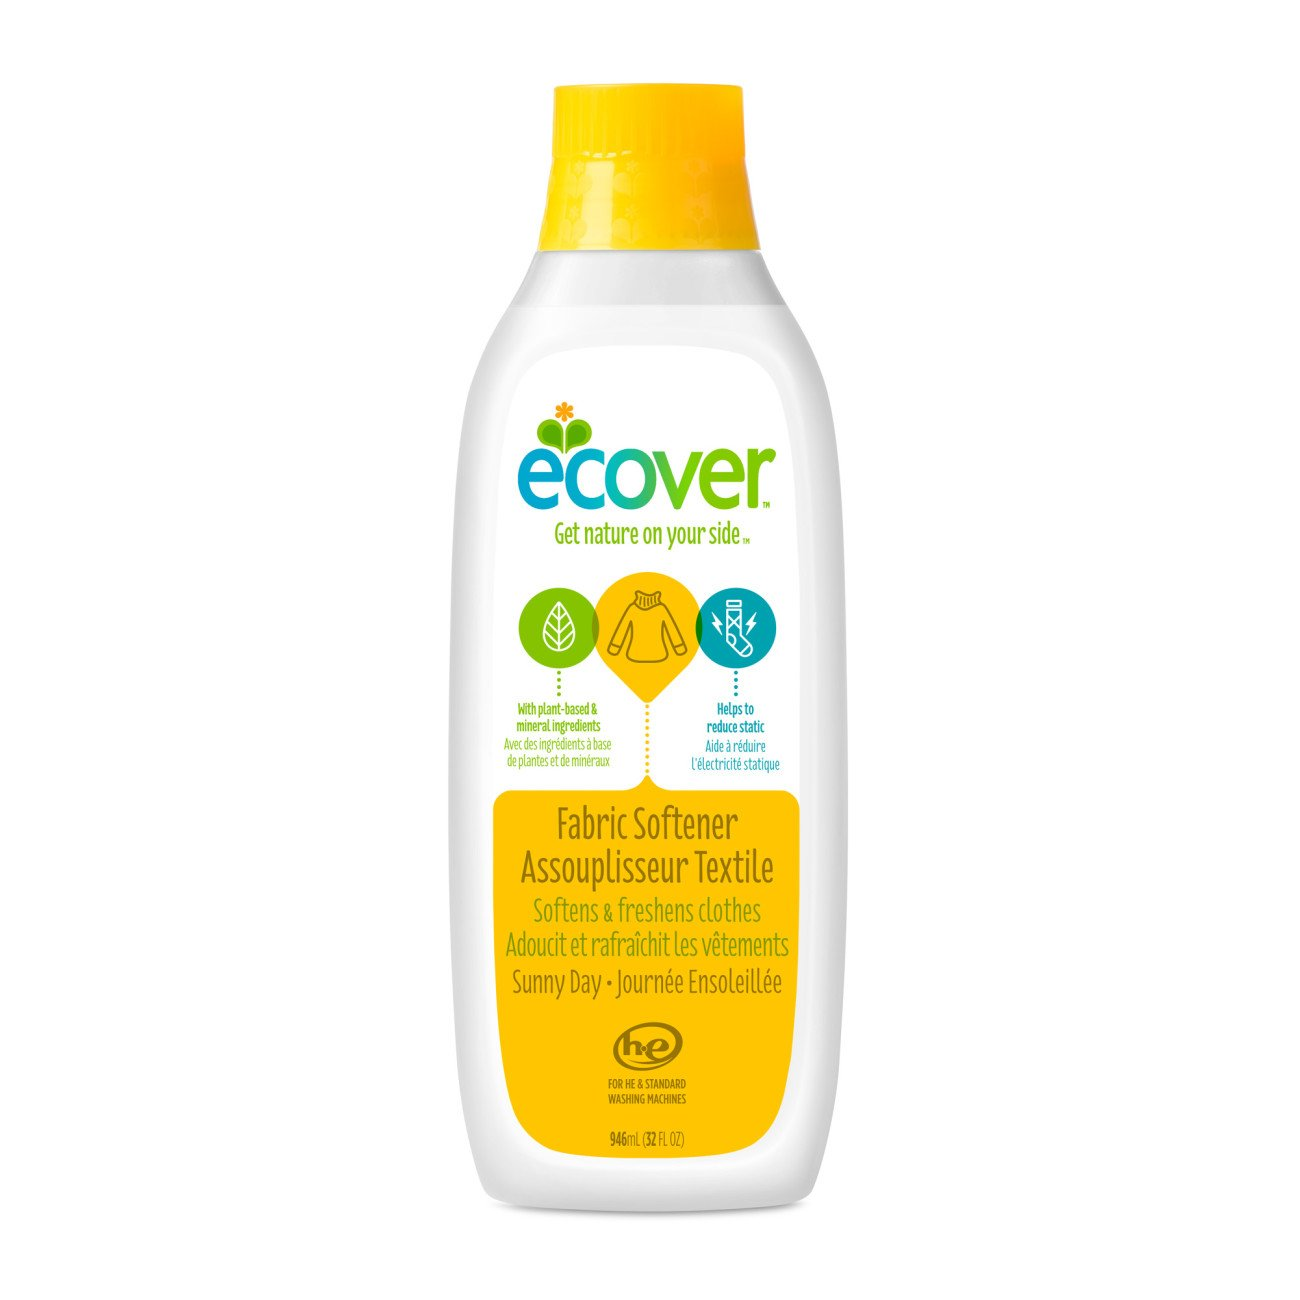 Ecover Fabric Softener Liquid, Sunny Day, 32 Fl Oz, Pack of 12